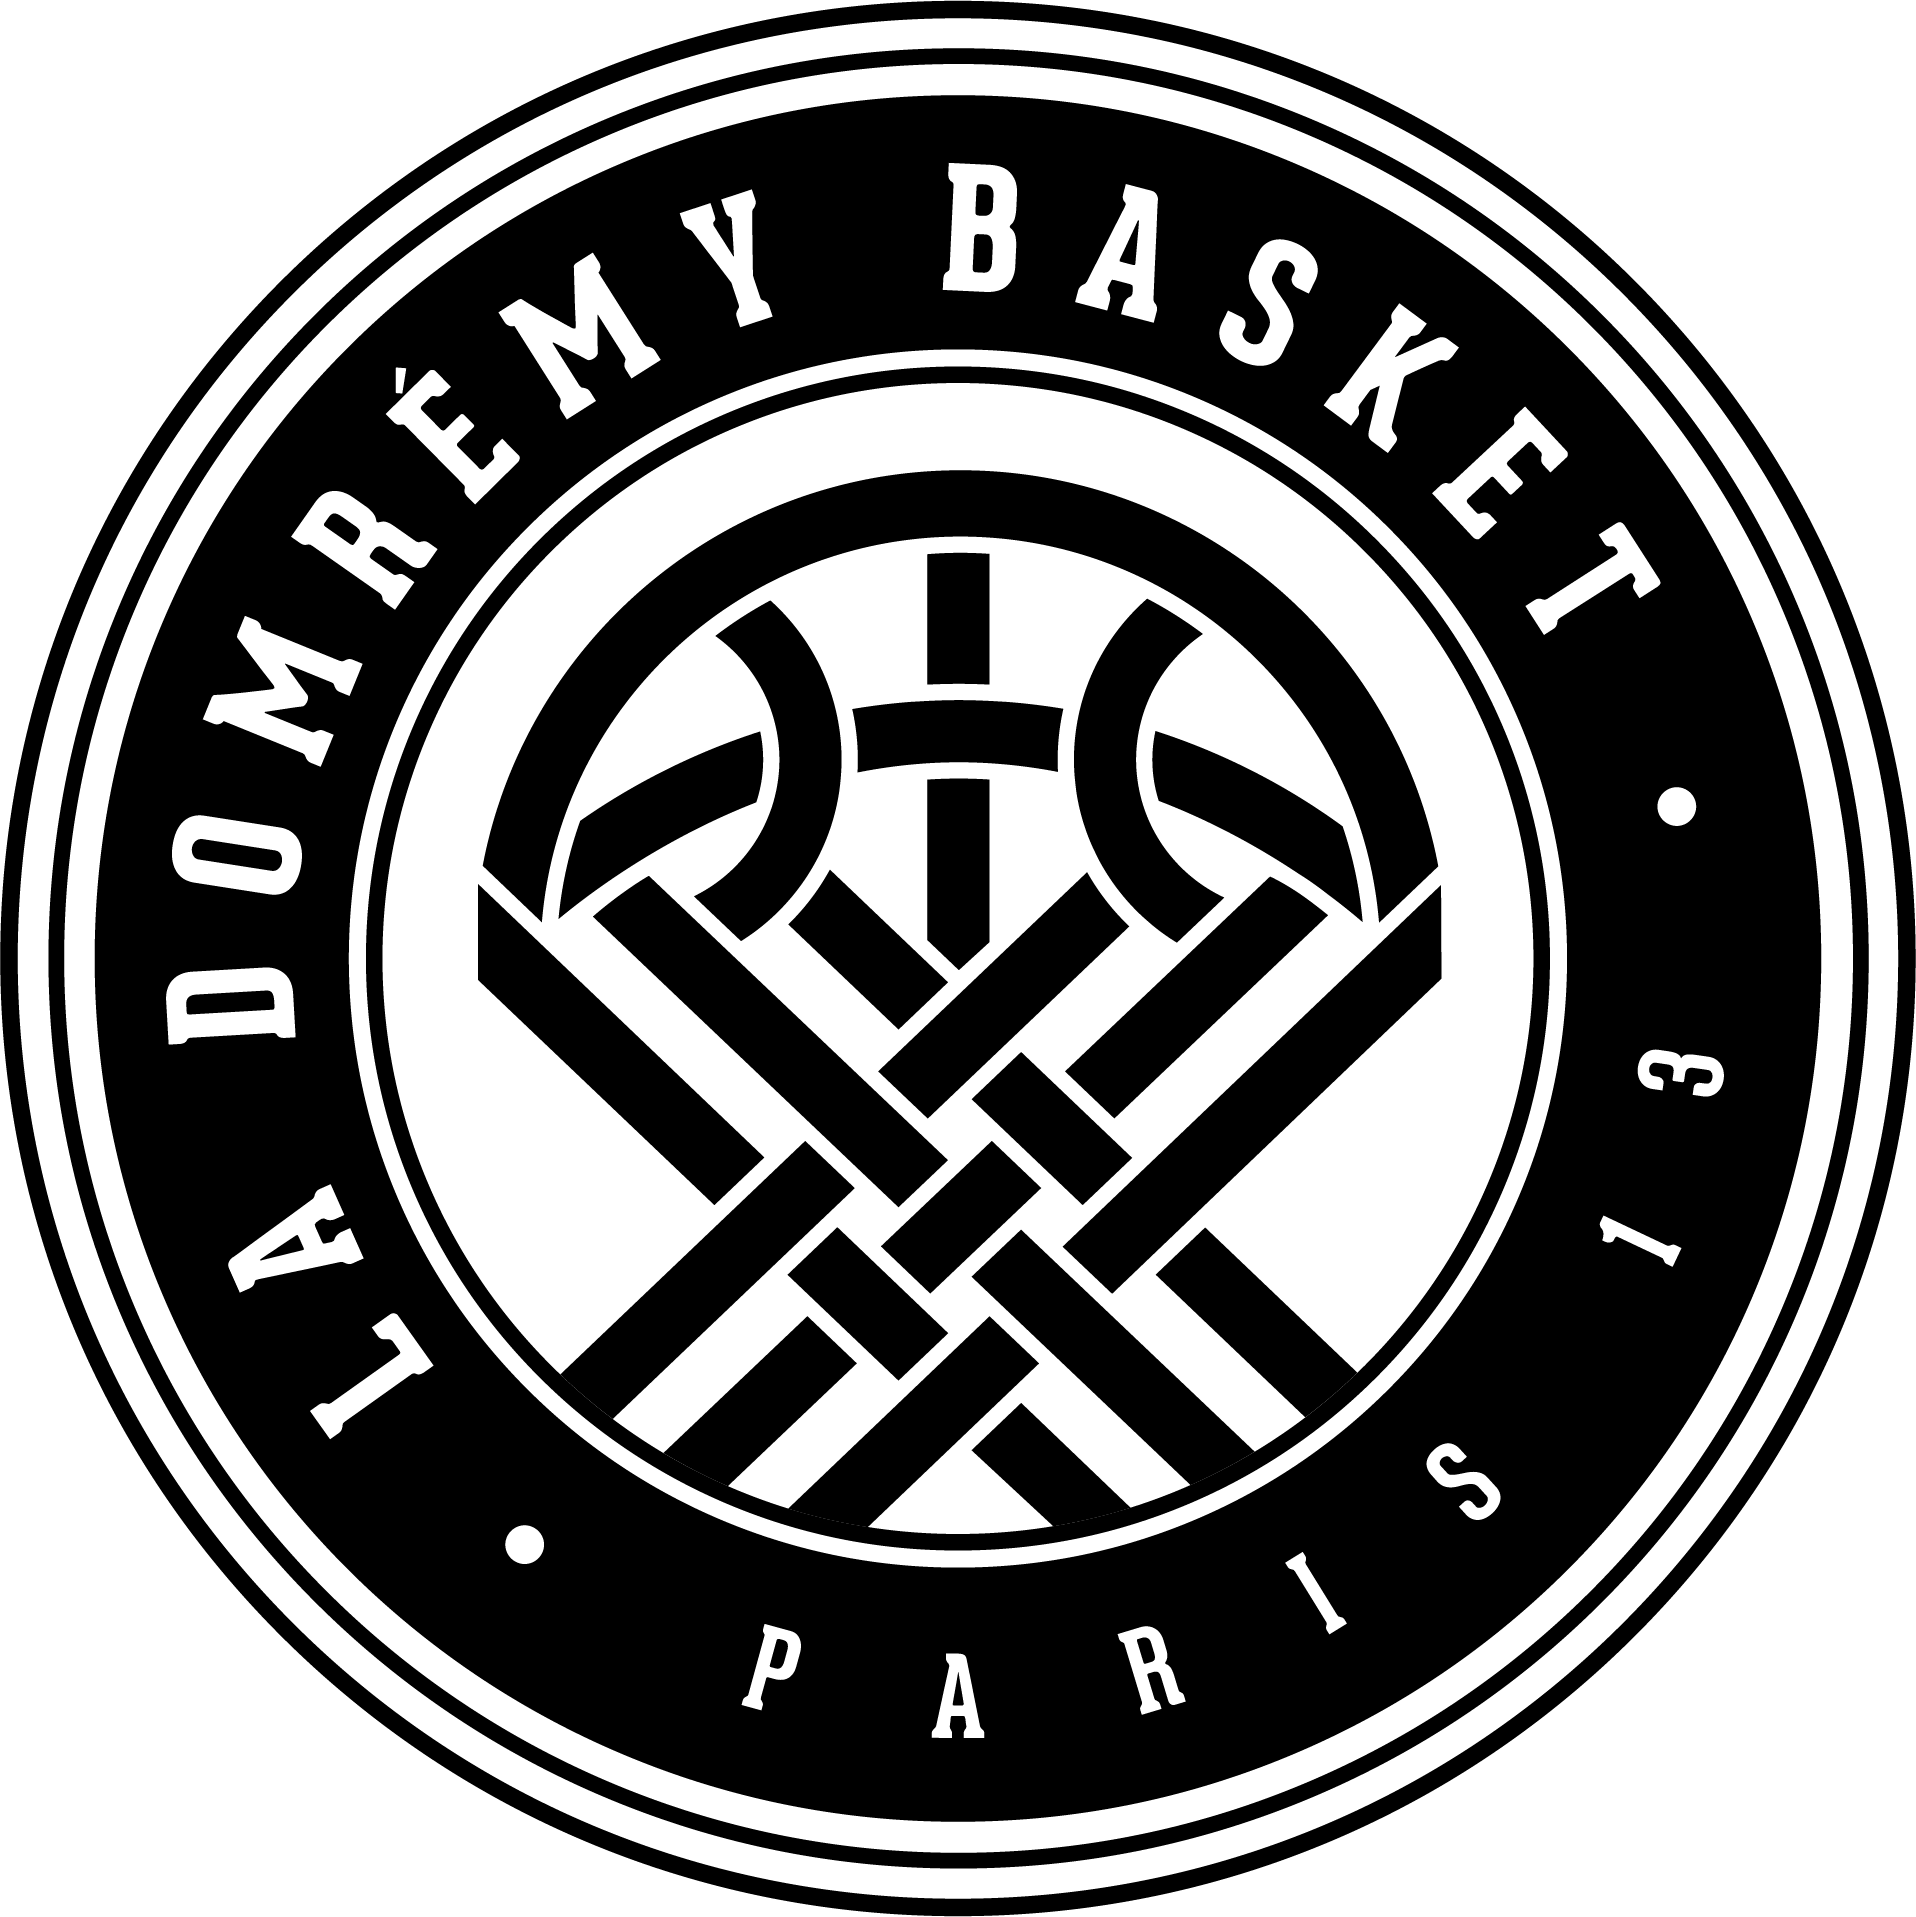 Domremy-basket-RVB-noir